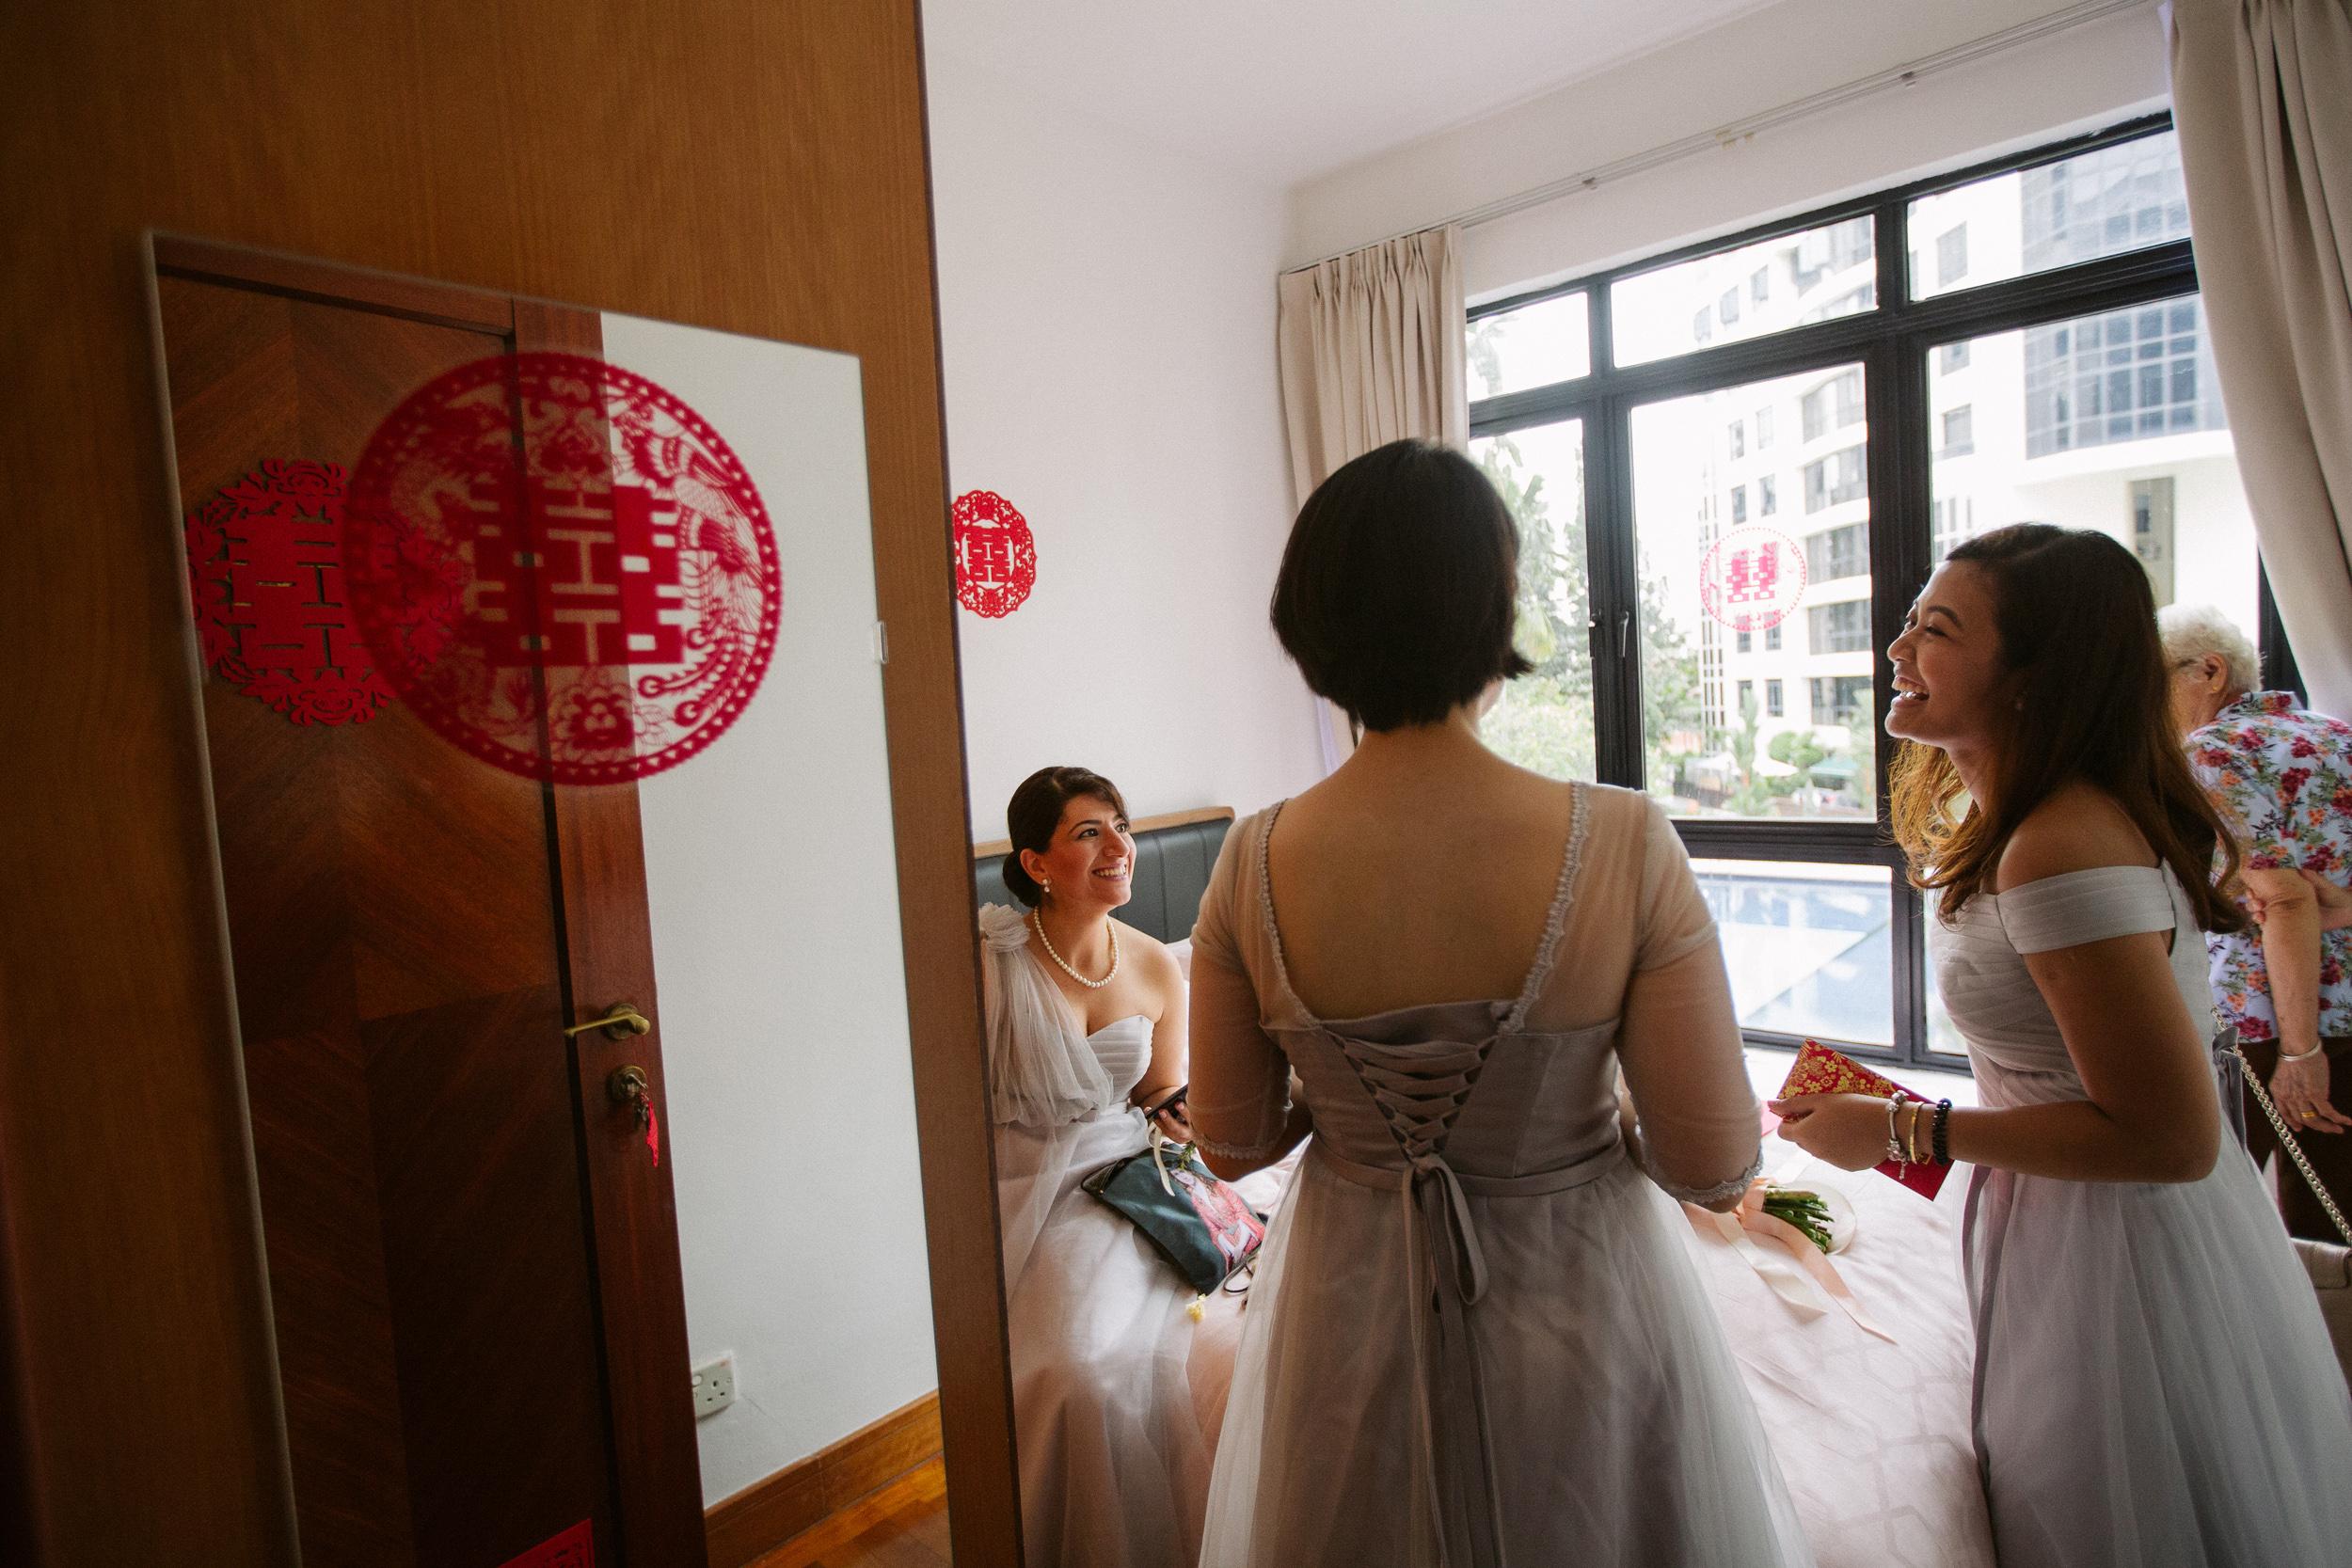 singapore-wedding-photographer-cheryl-matthew-fullerton-hotel-wedding-28.jpg